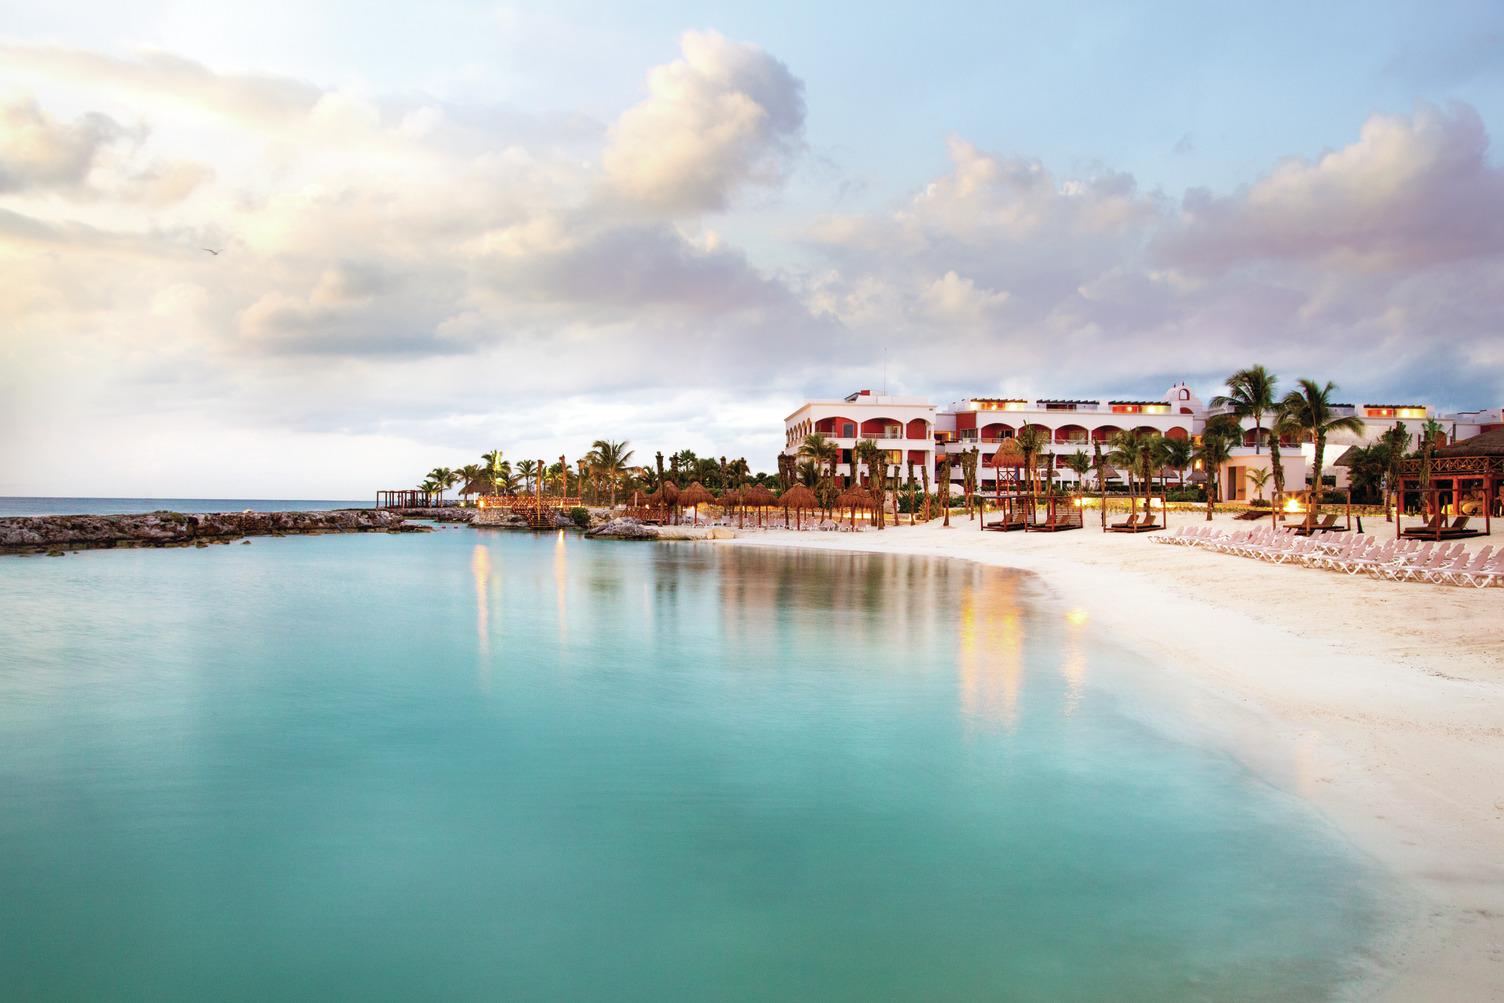 Travel Agency All-Inclusive Resort Heaven at Hard Rock Hotel Riviera Maya 07